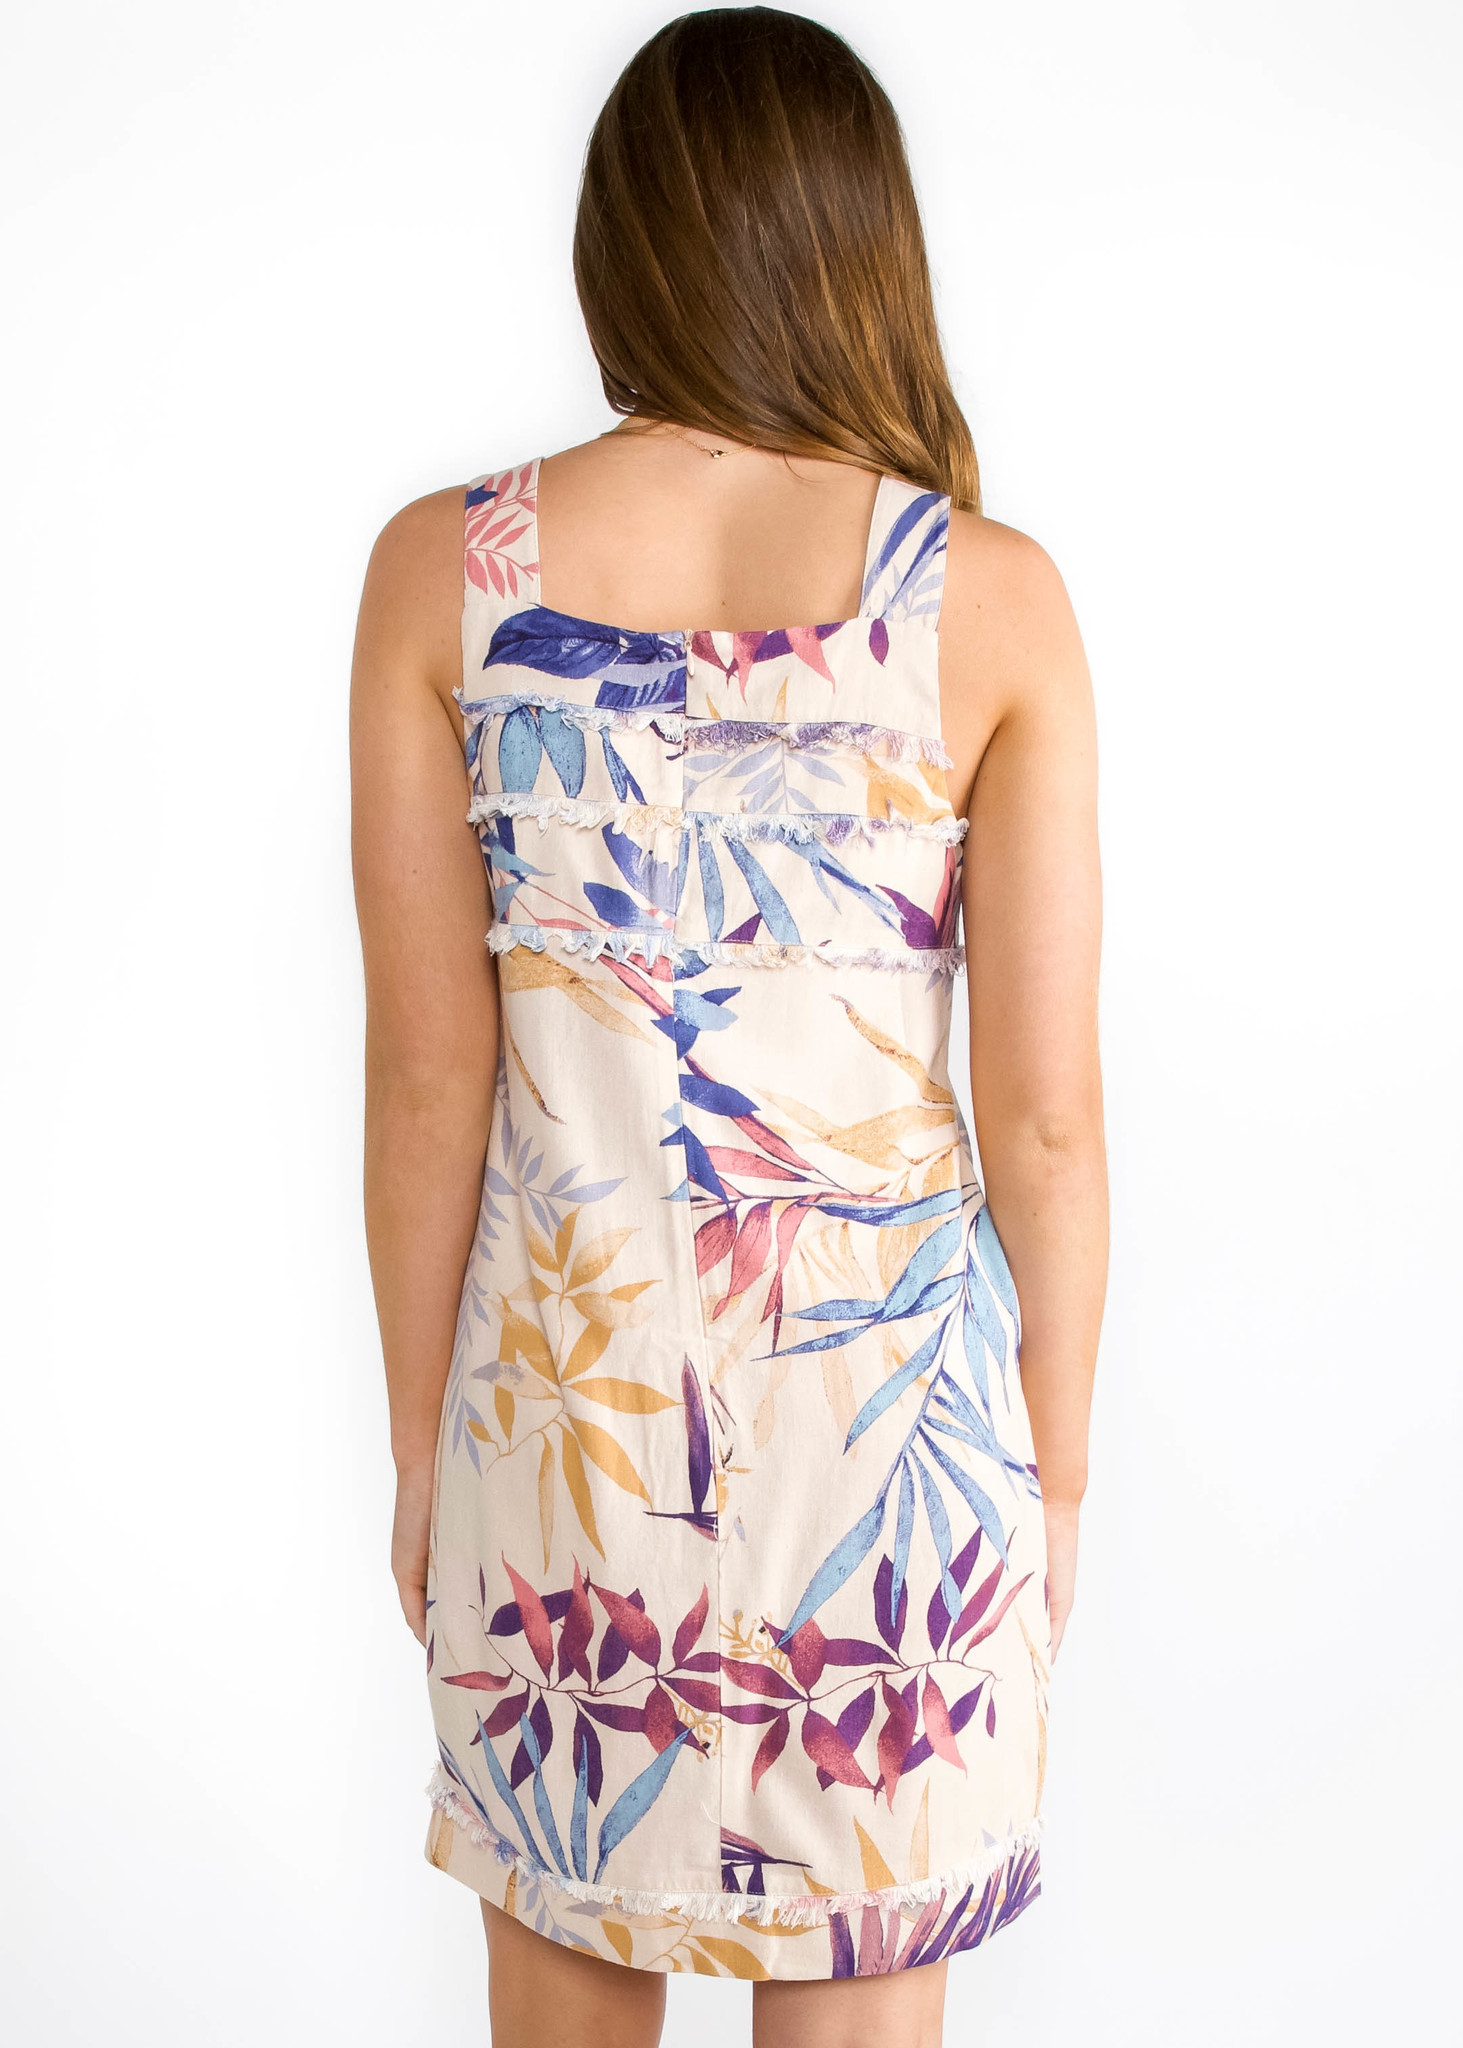 OCEAN ADVENTURE SHIFT DRESS